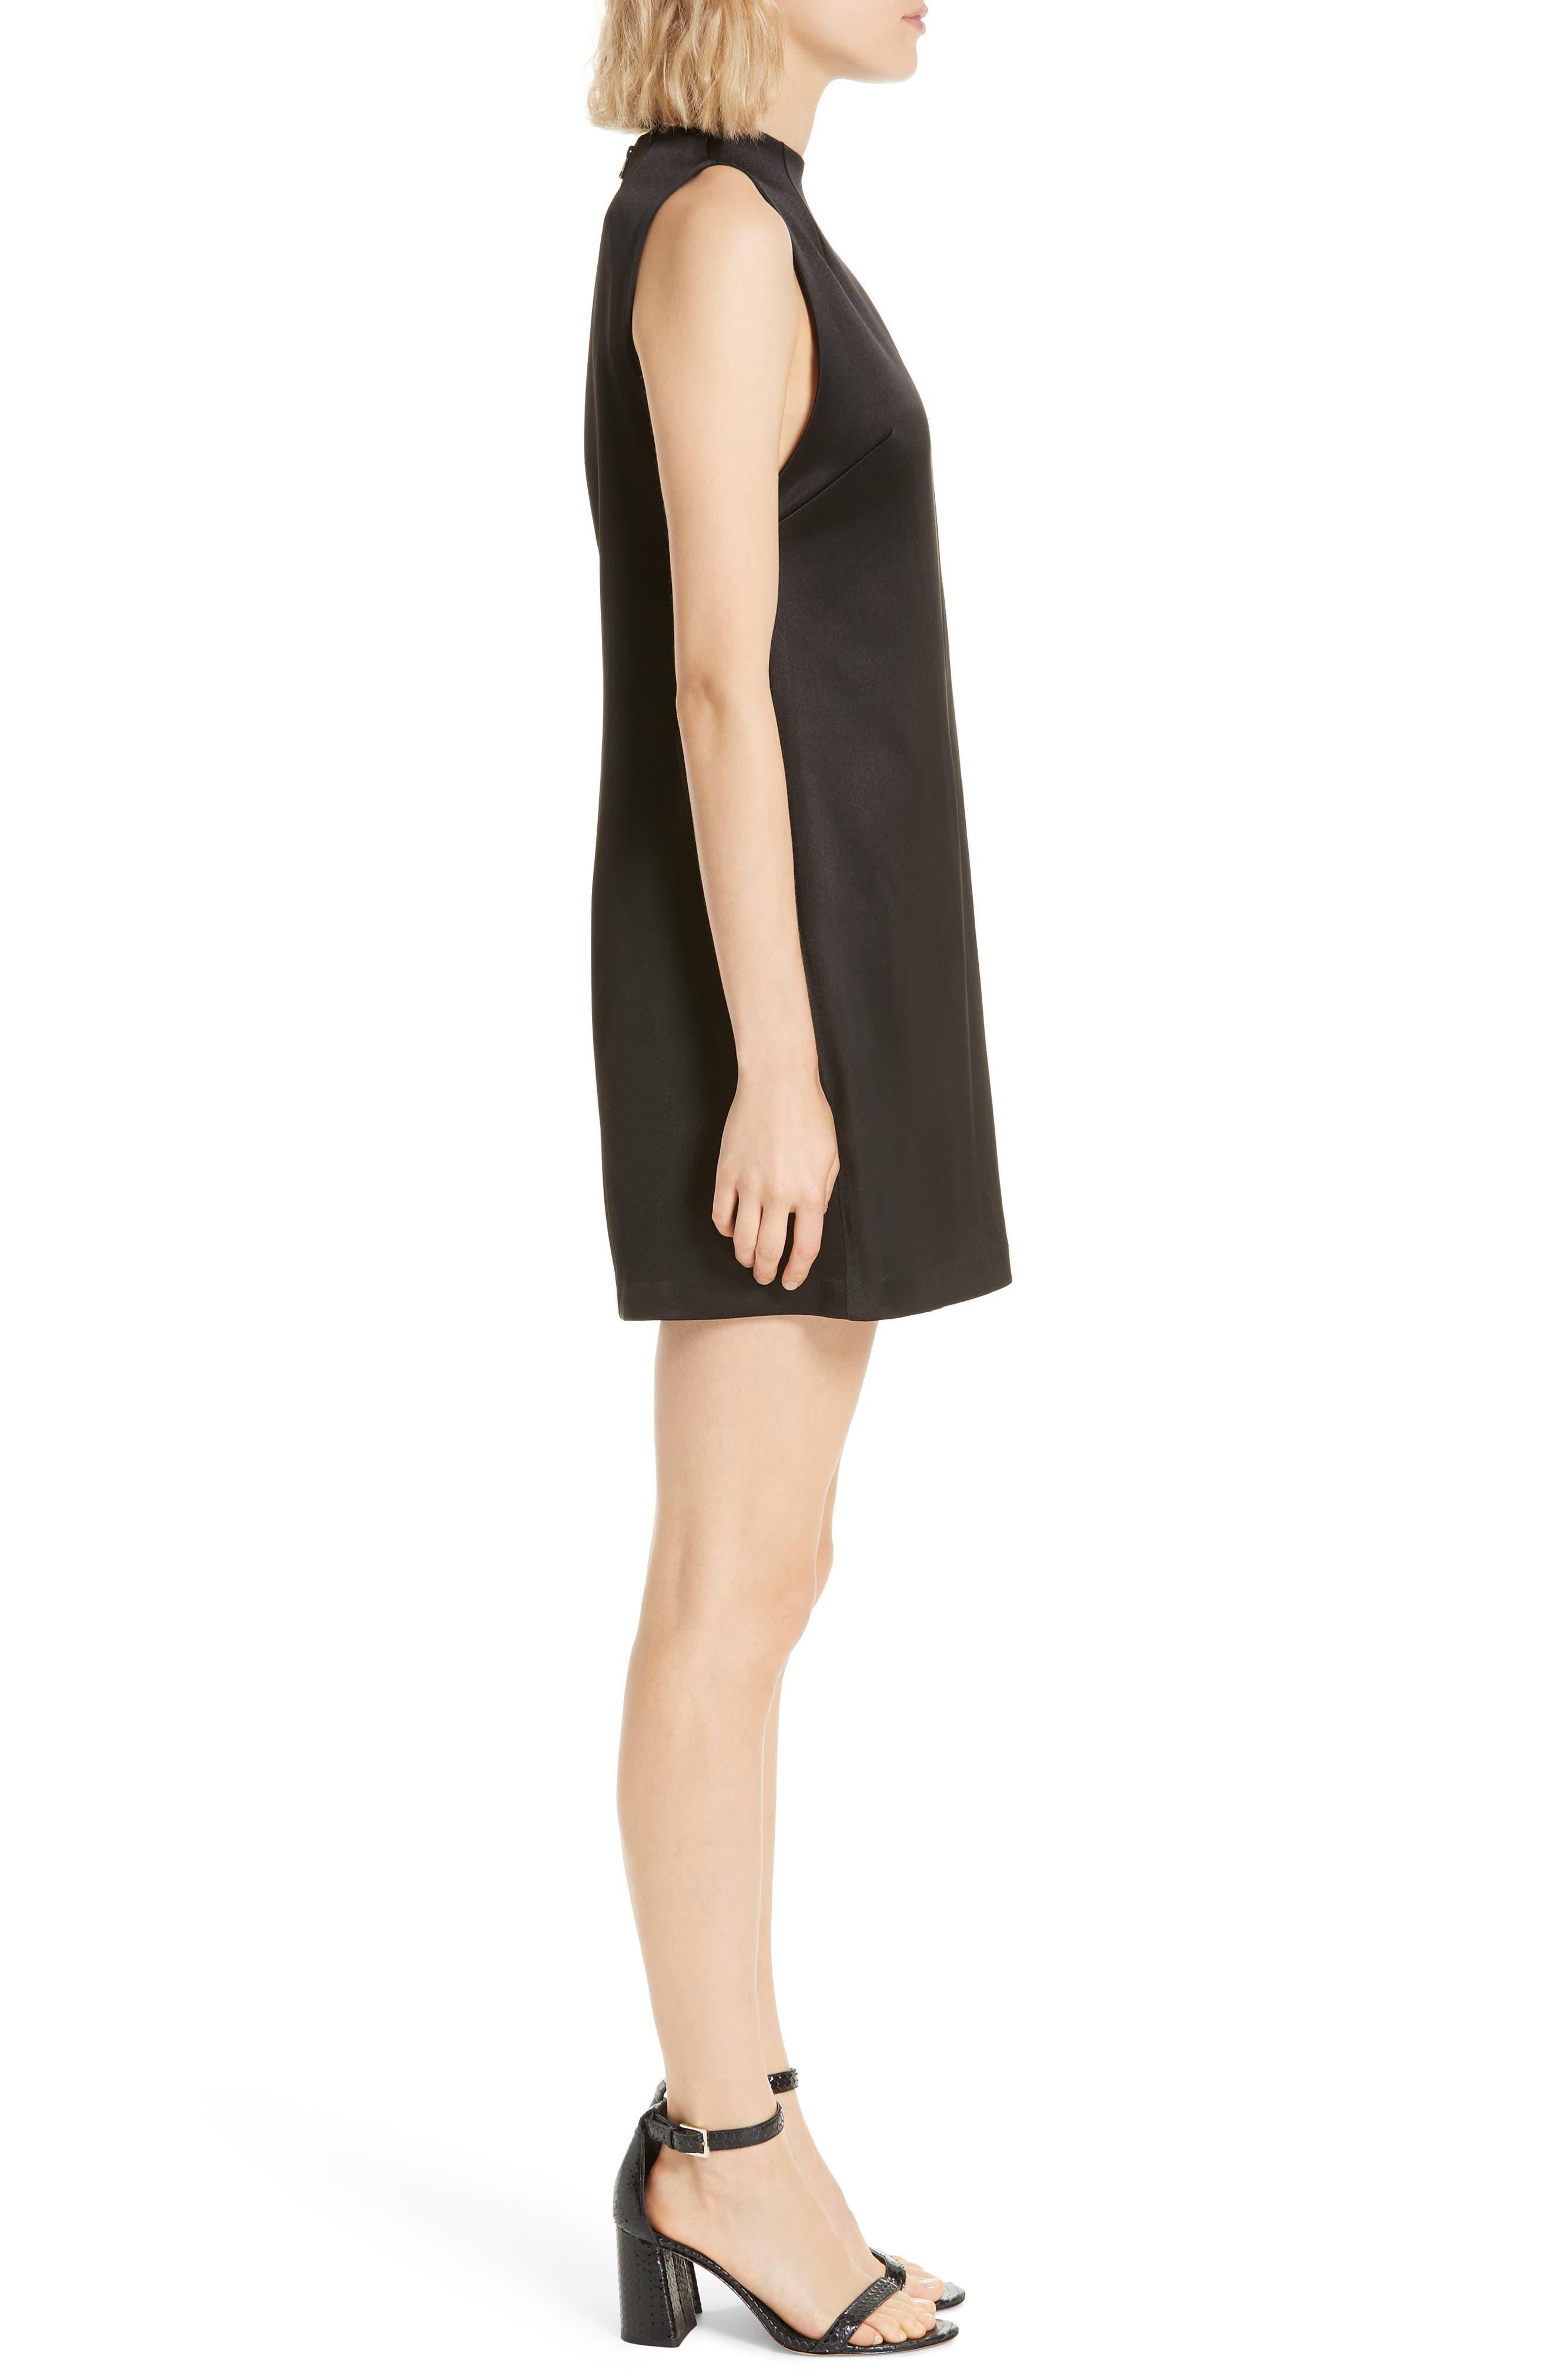 ALICE + OLIVIA,                             Coley A-Line Shift Dress,                             Alternate thumbnail 4, color,                             BLACK